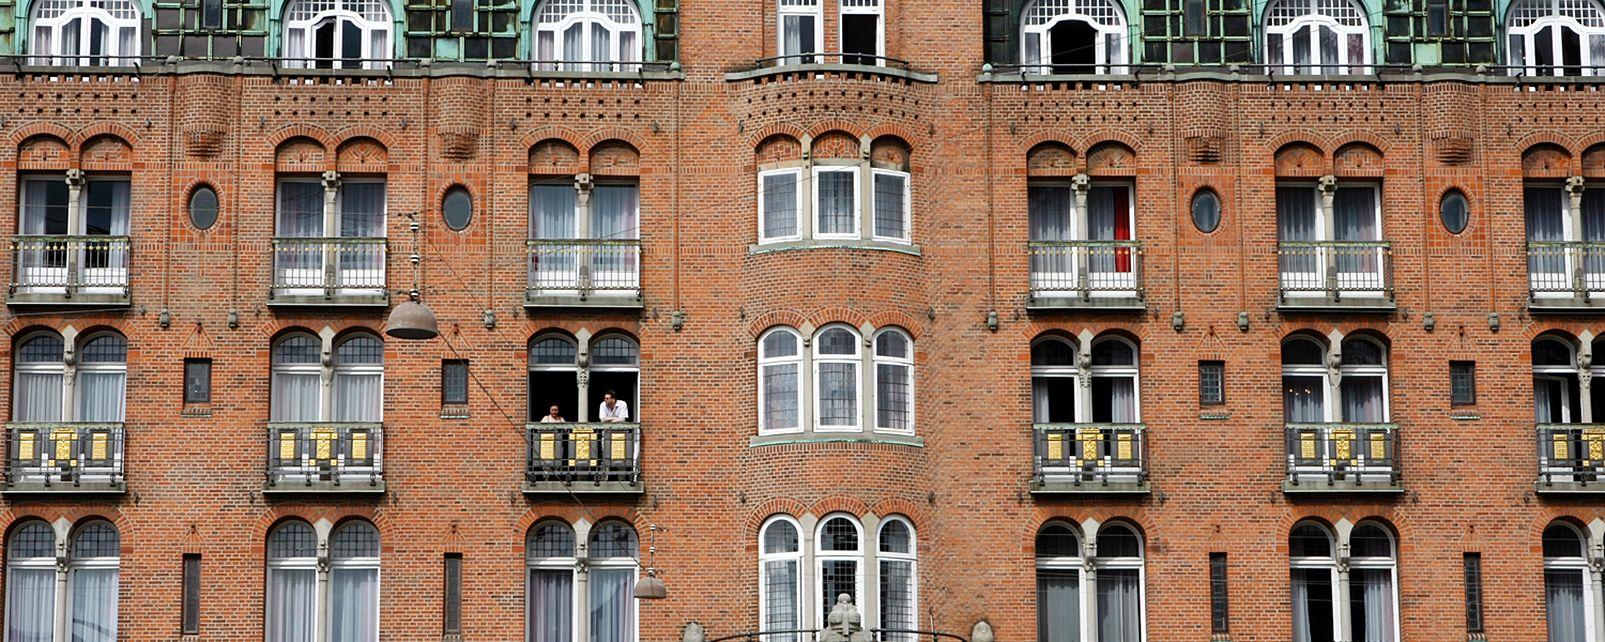 Hotel Scandic Palace